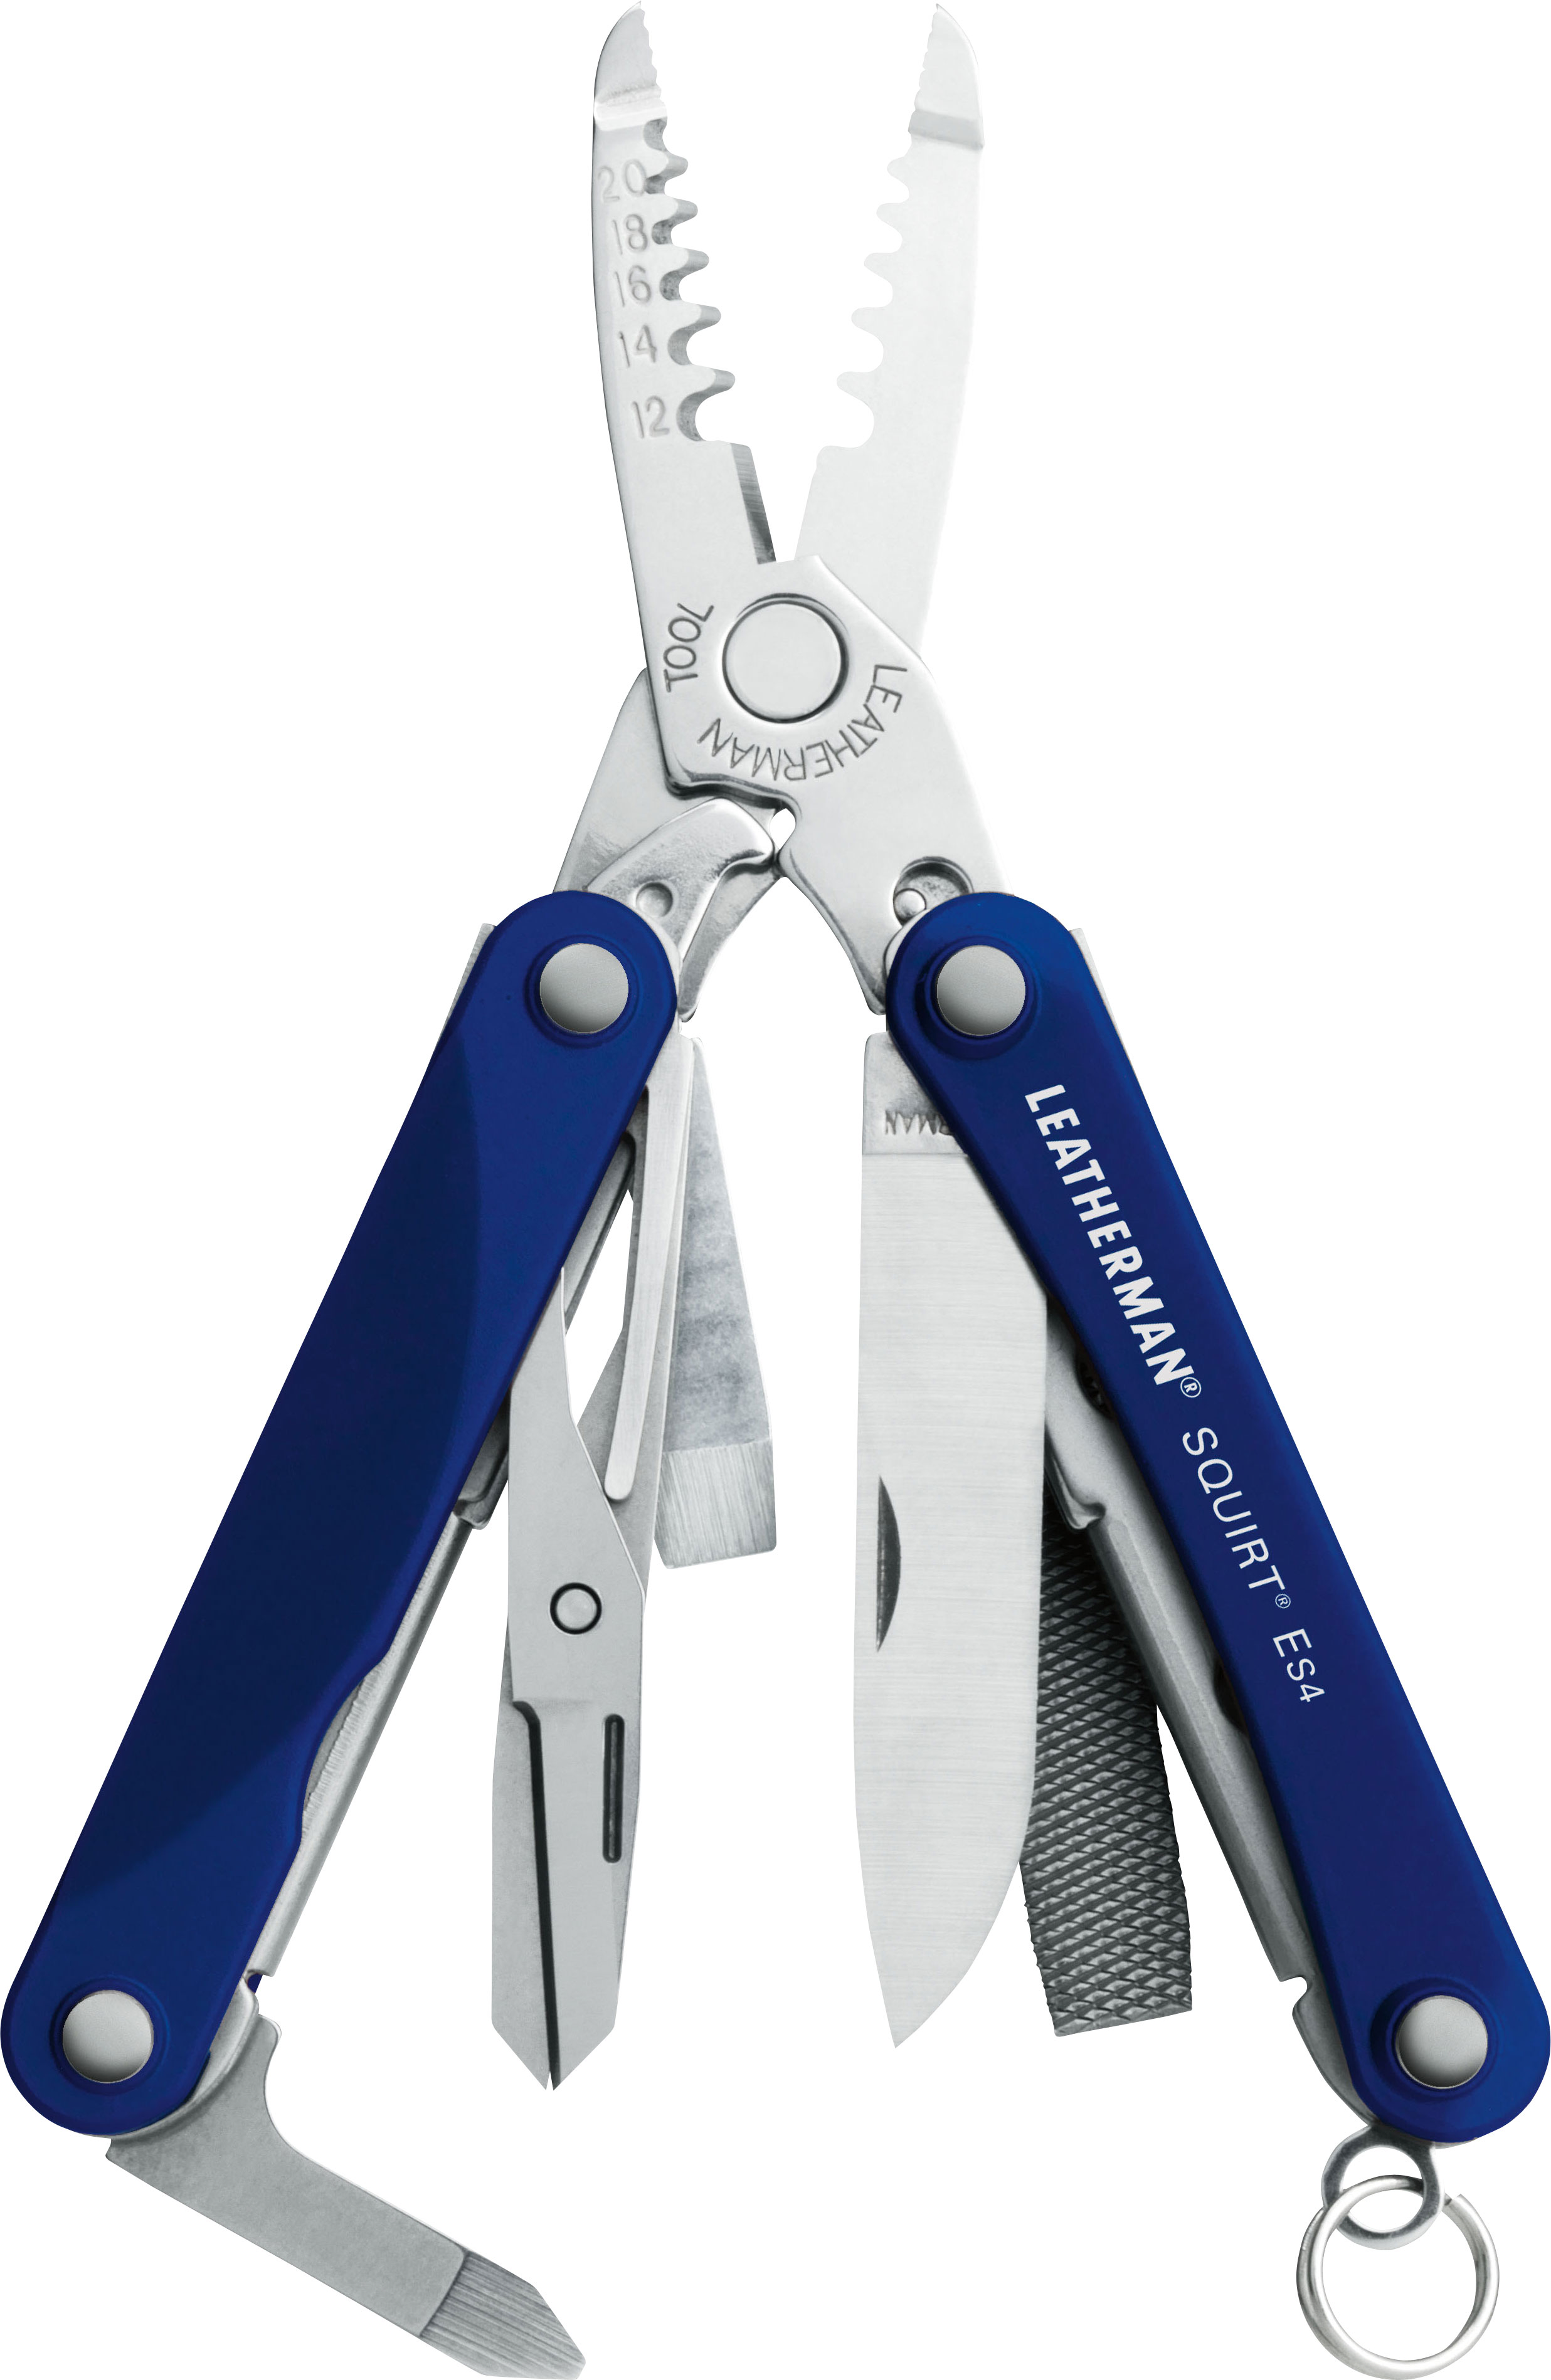 Leatherman Squirt ES4 Keychain Electrician's Mini Multi-Tool, Blue Aluminum Handles